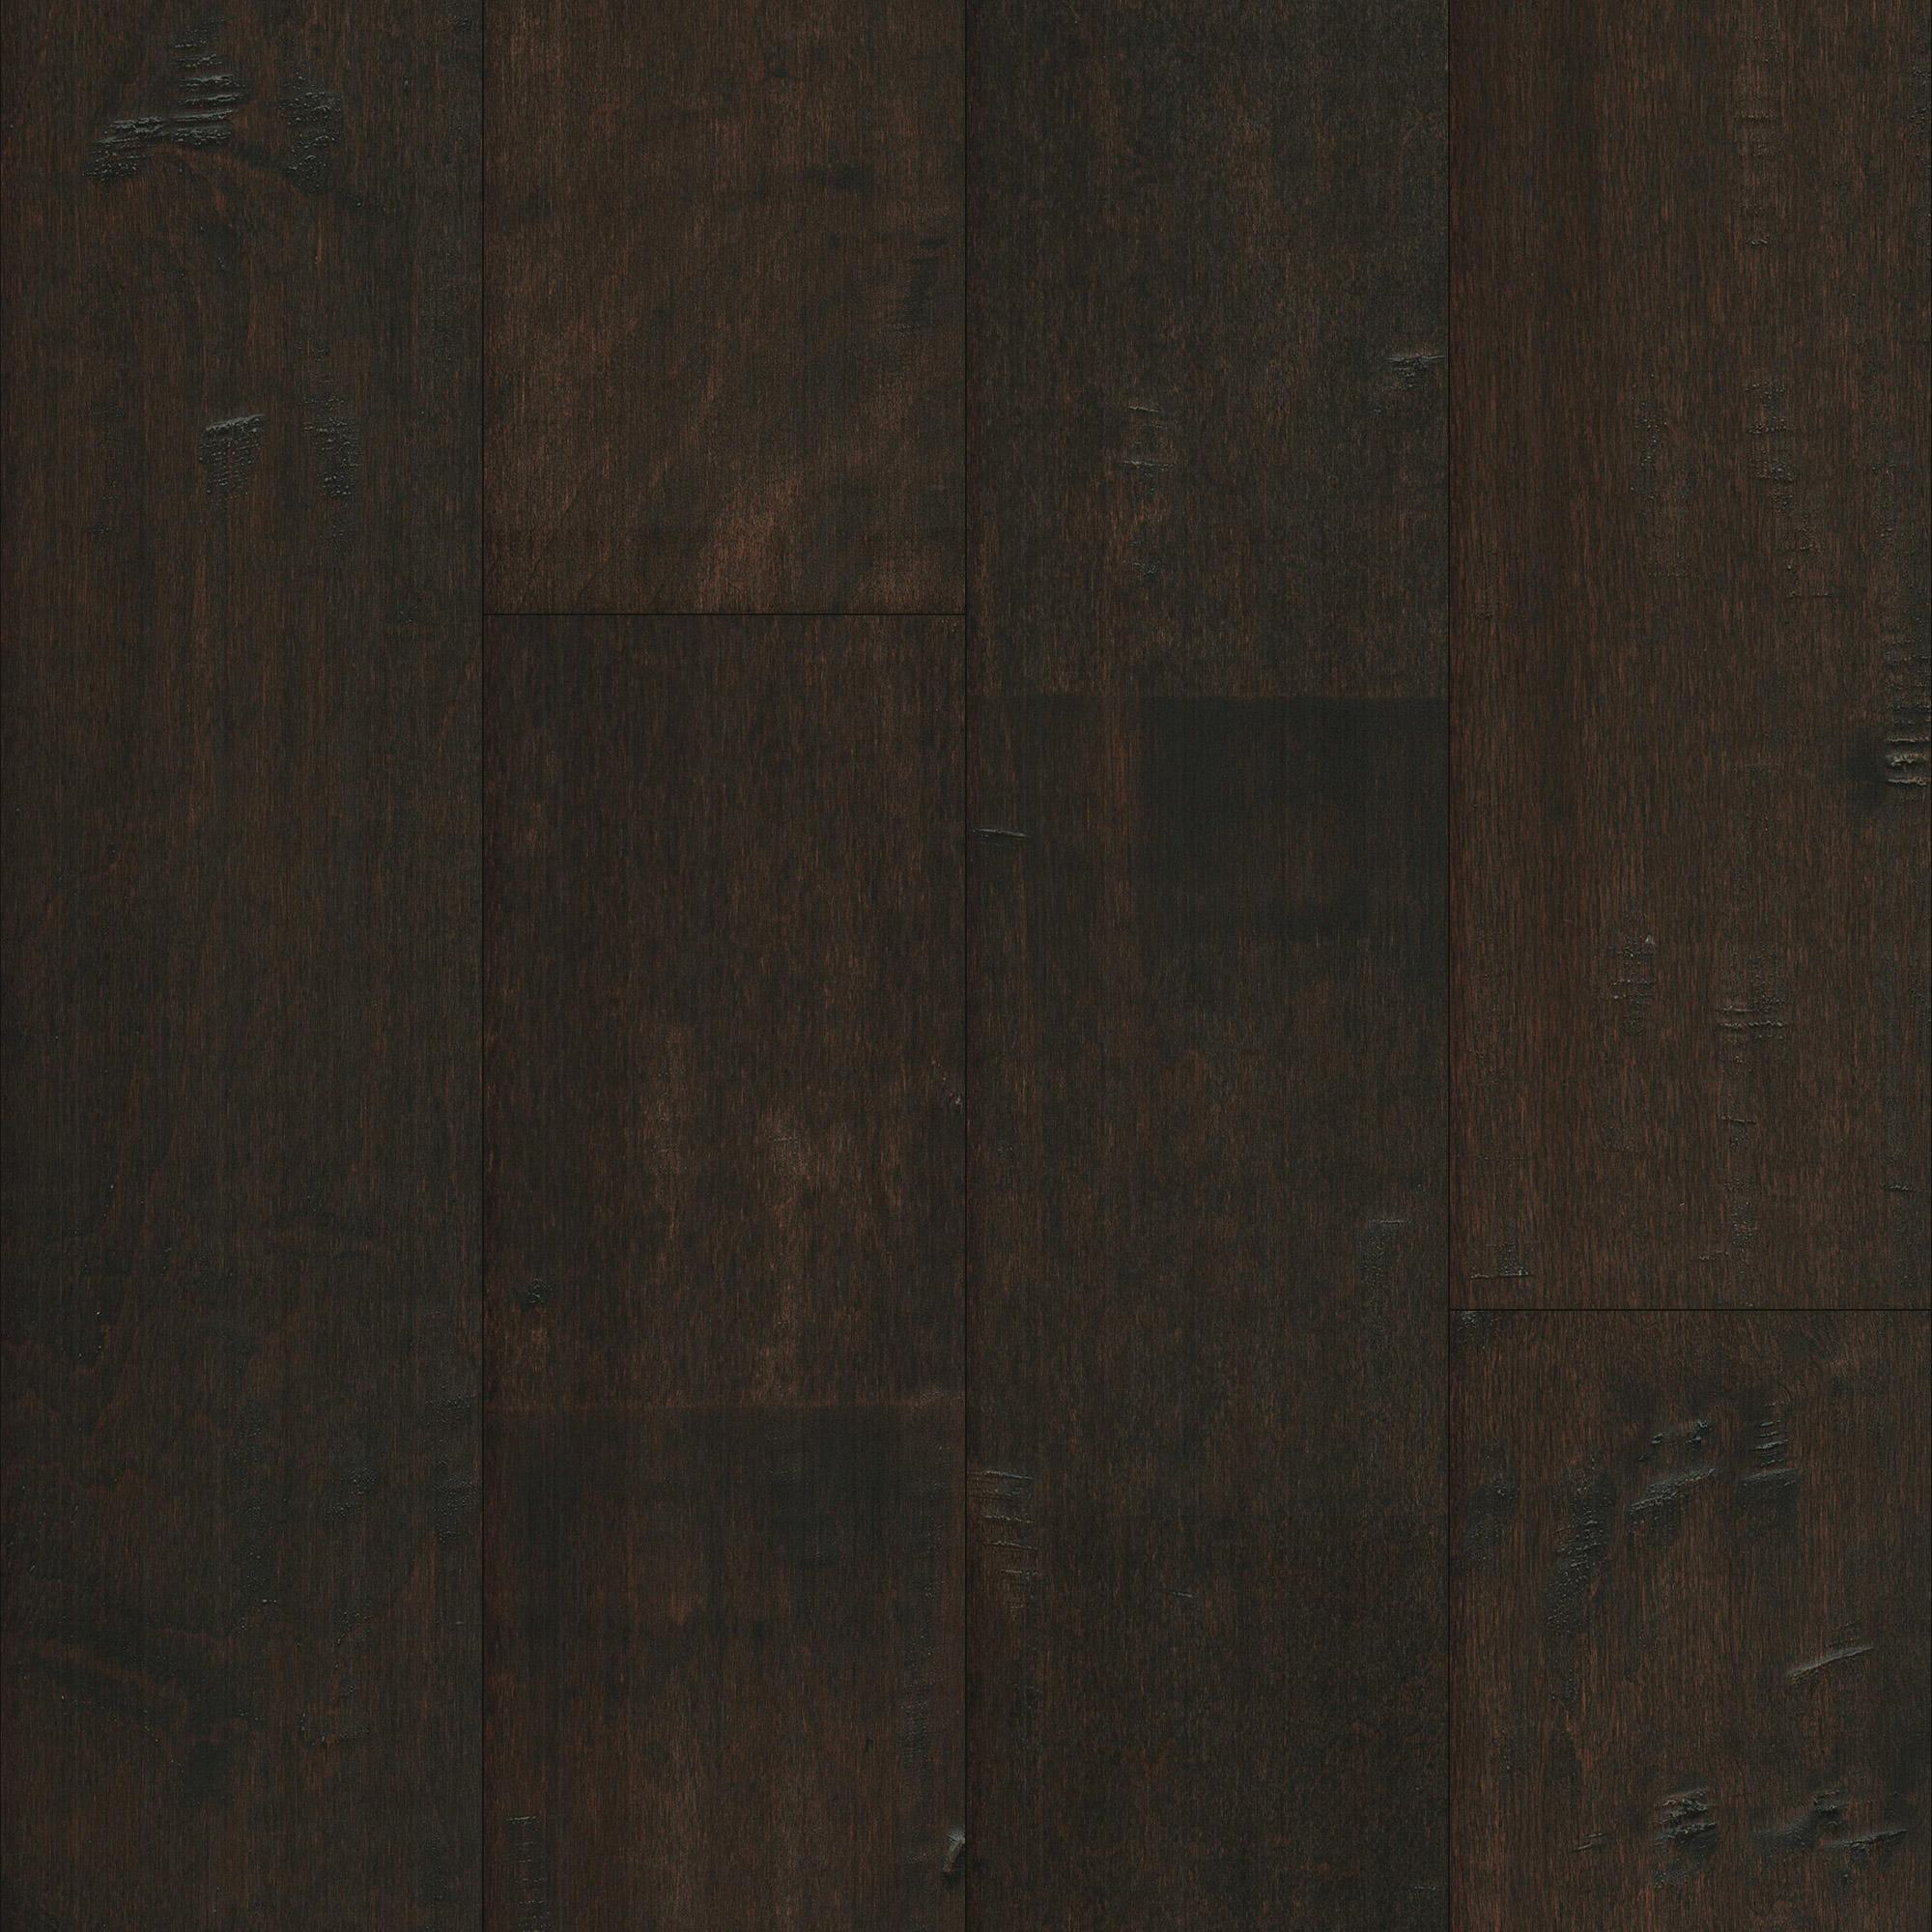 7 inch hardwood flooring of mullican san marco sculpted maple dark mocha 5 engineered hardwood for mullican san marco sculpted maple dark mocha 5 engineered hardwood flooring